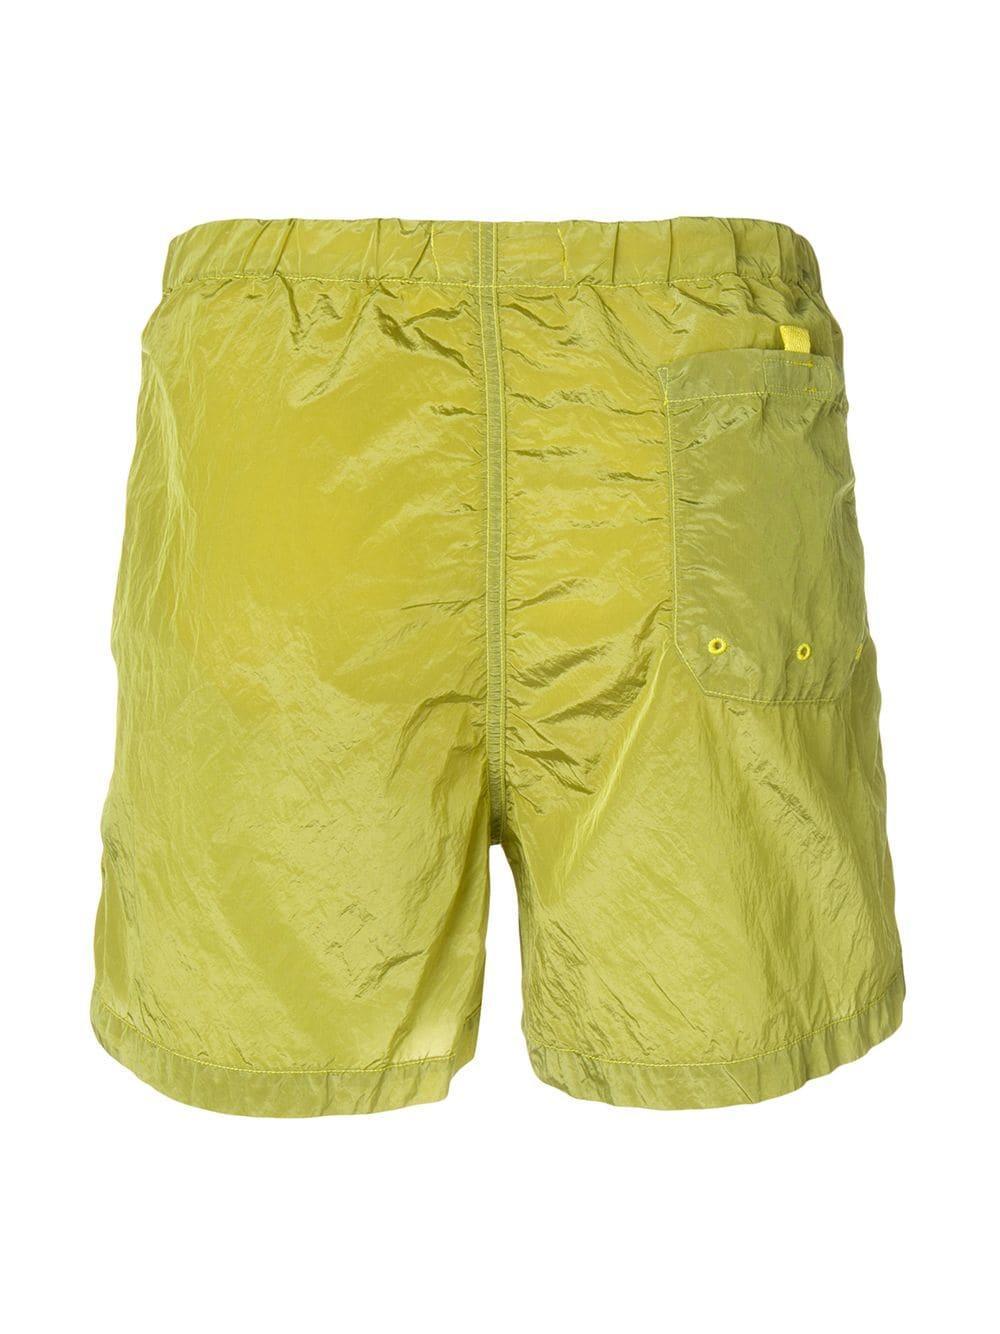 7e1c54915d Stone Island Drawstring Waist Swimming Shorts in Green for Men - Lyst